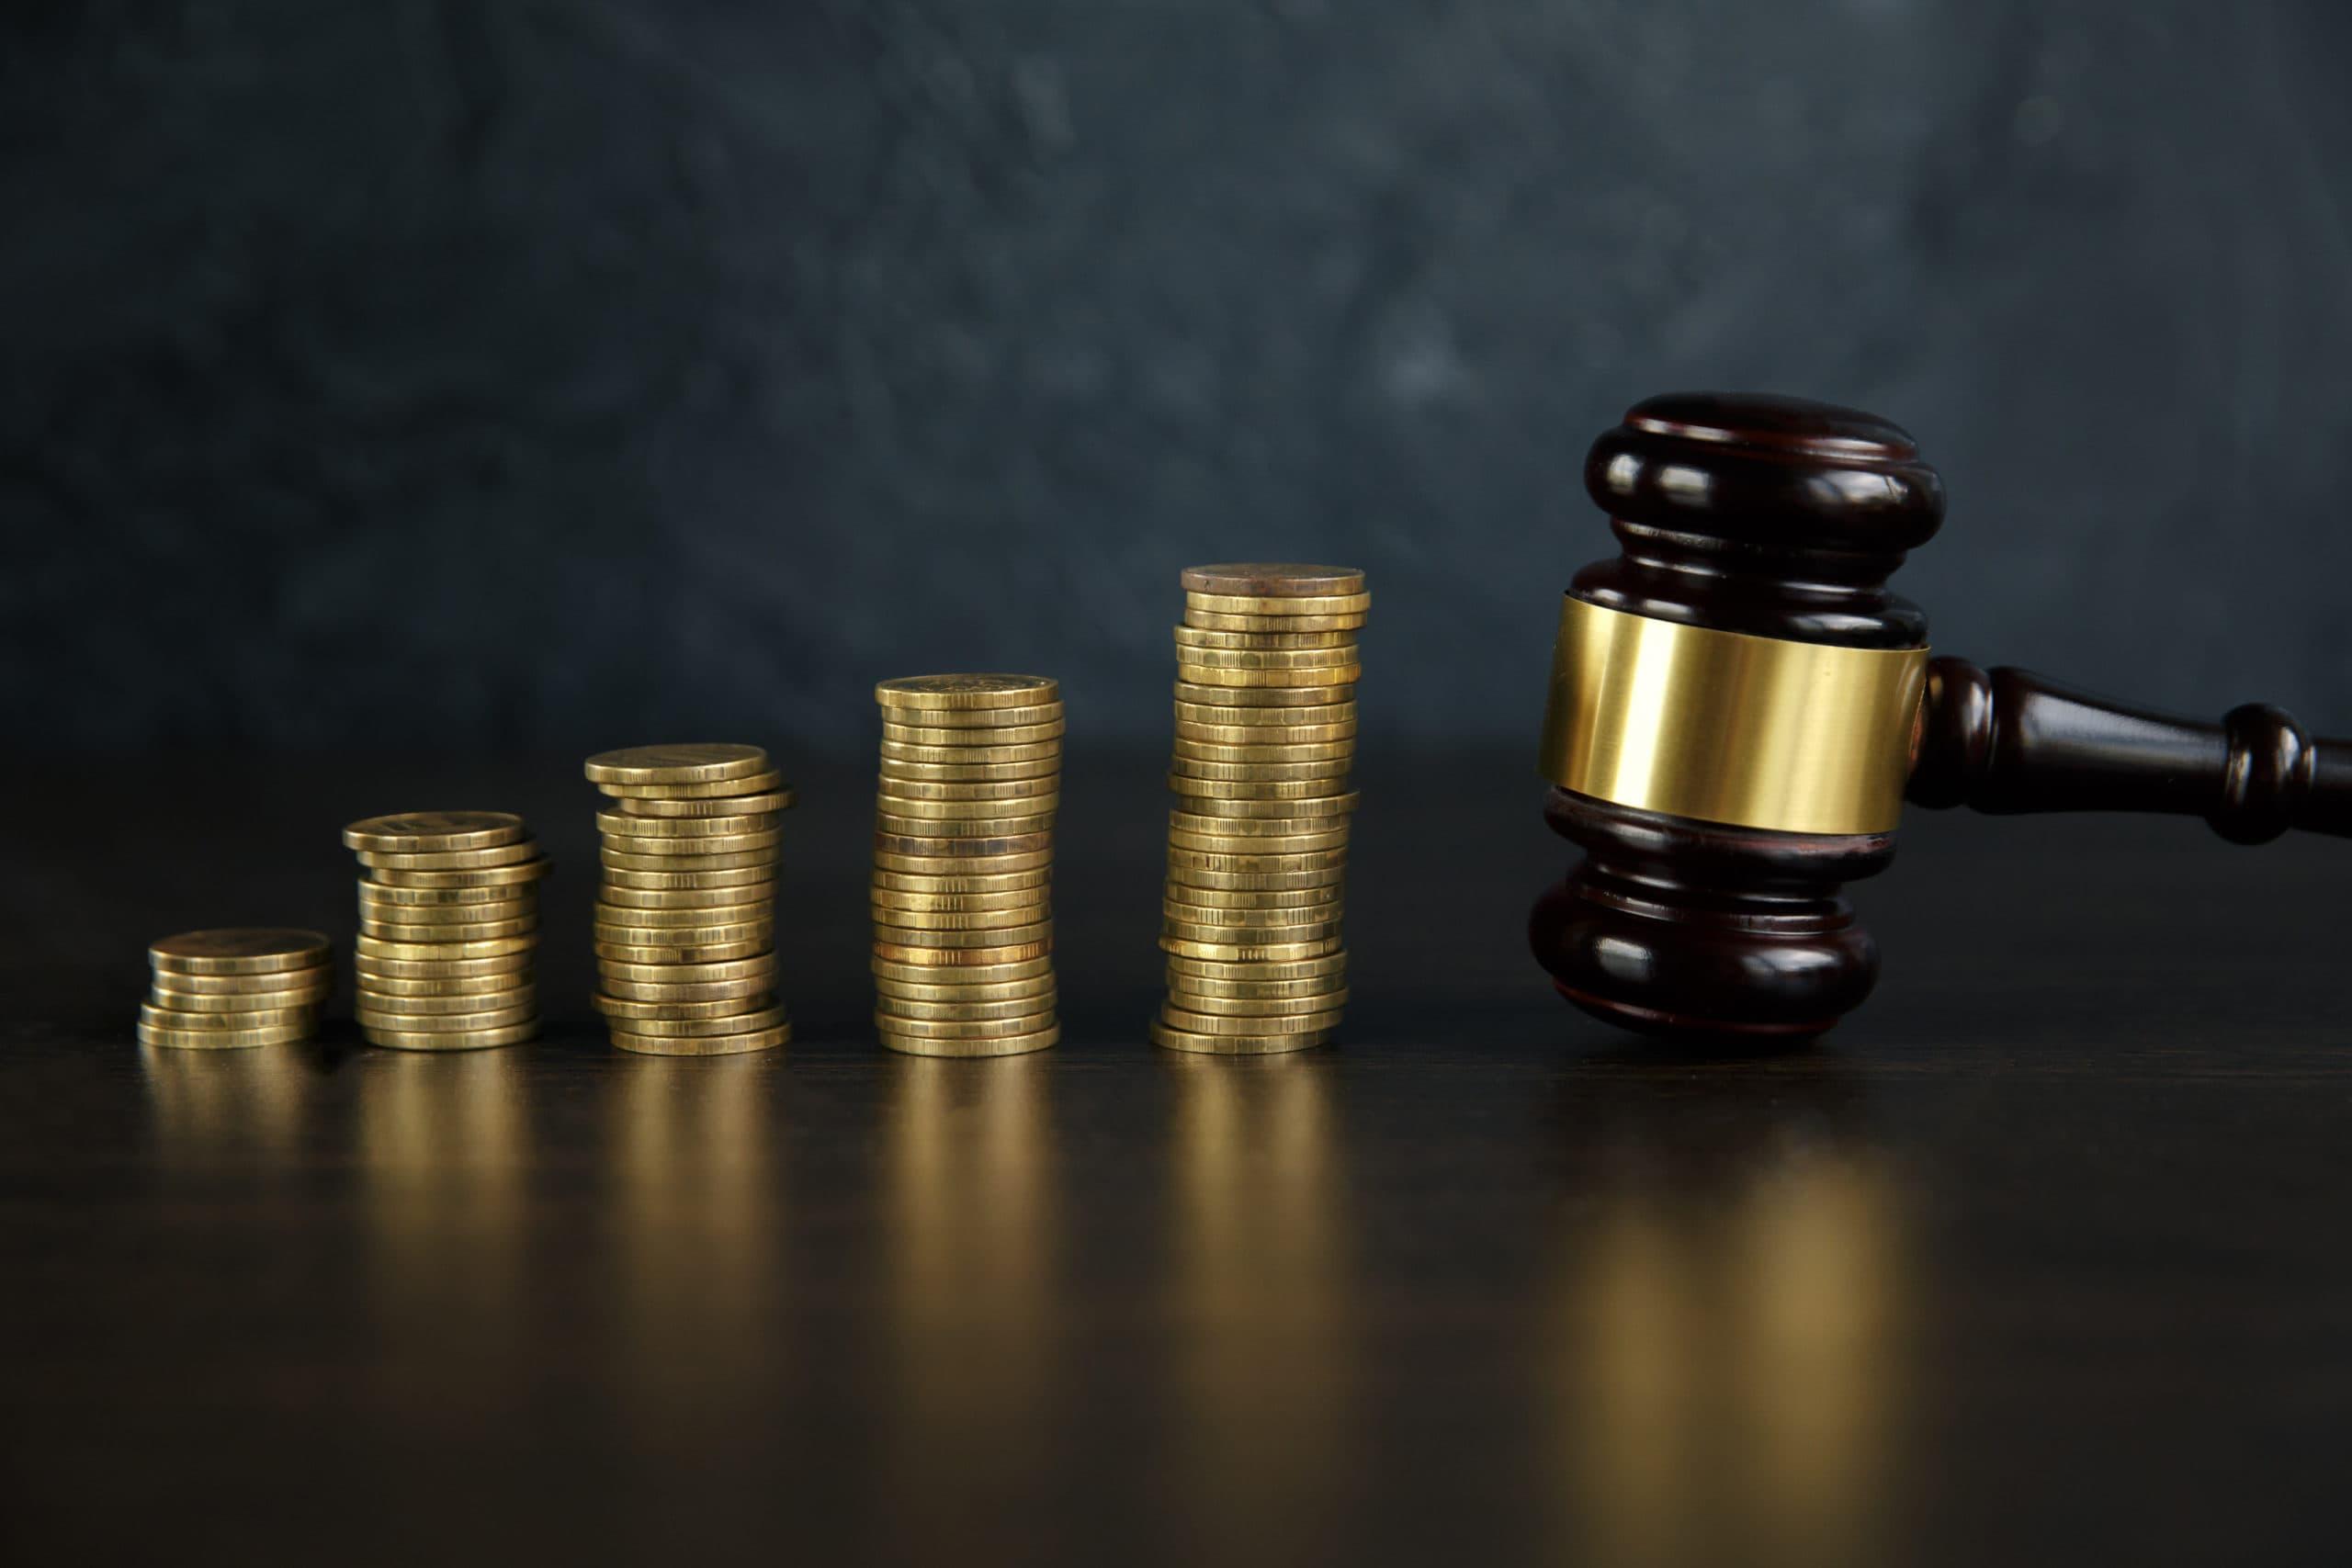 court coins